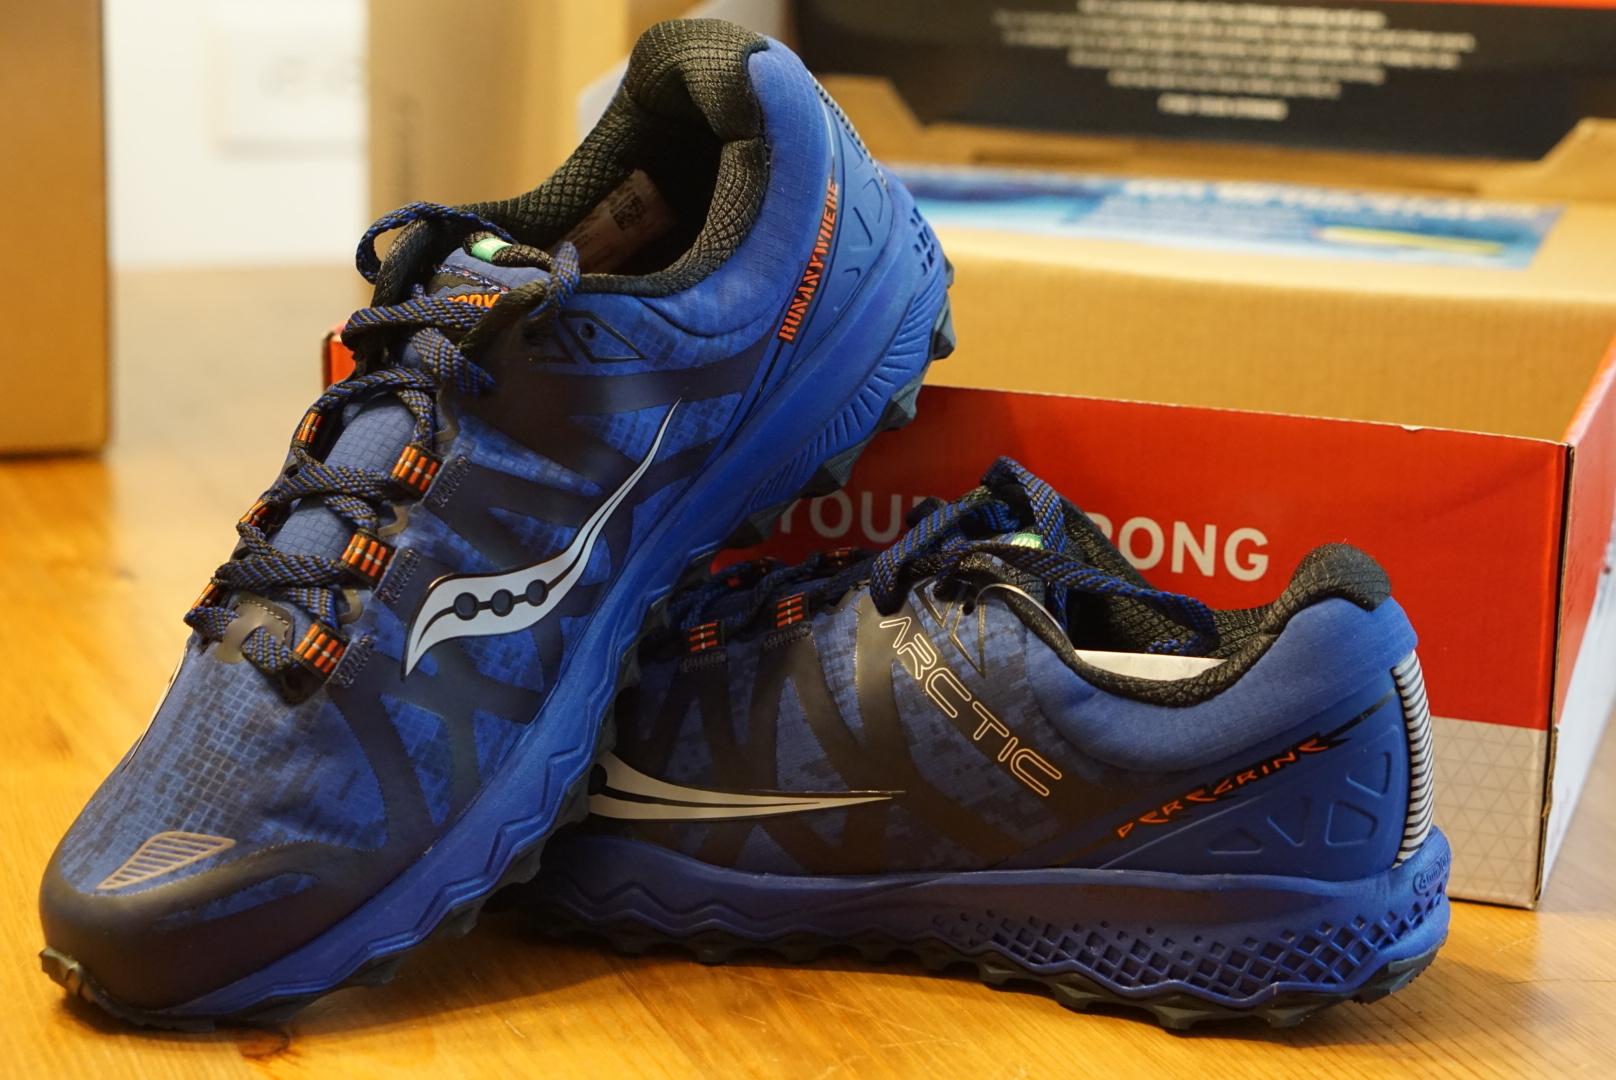 Shoe Review: Saucony Peregrine 7 ICE